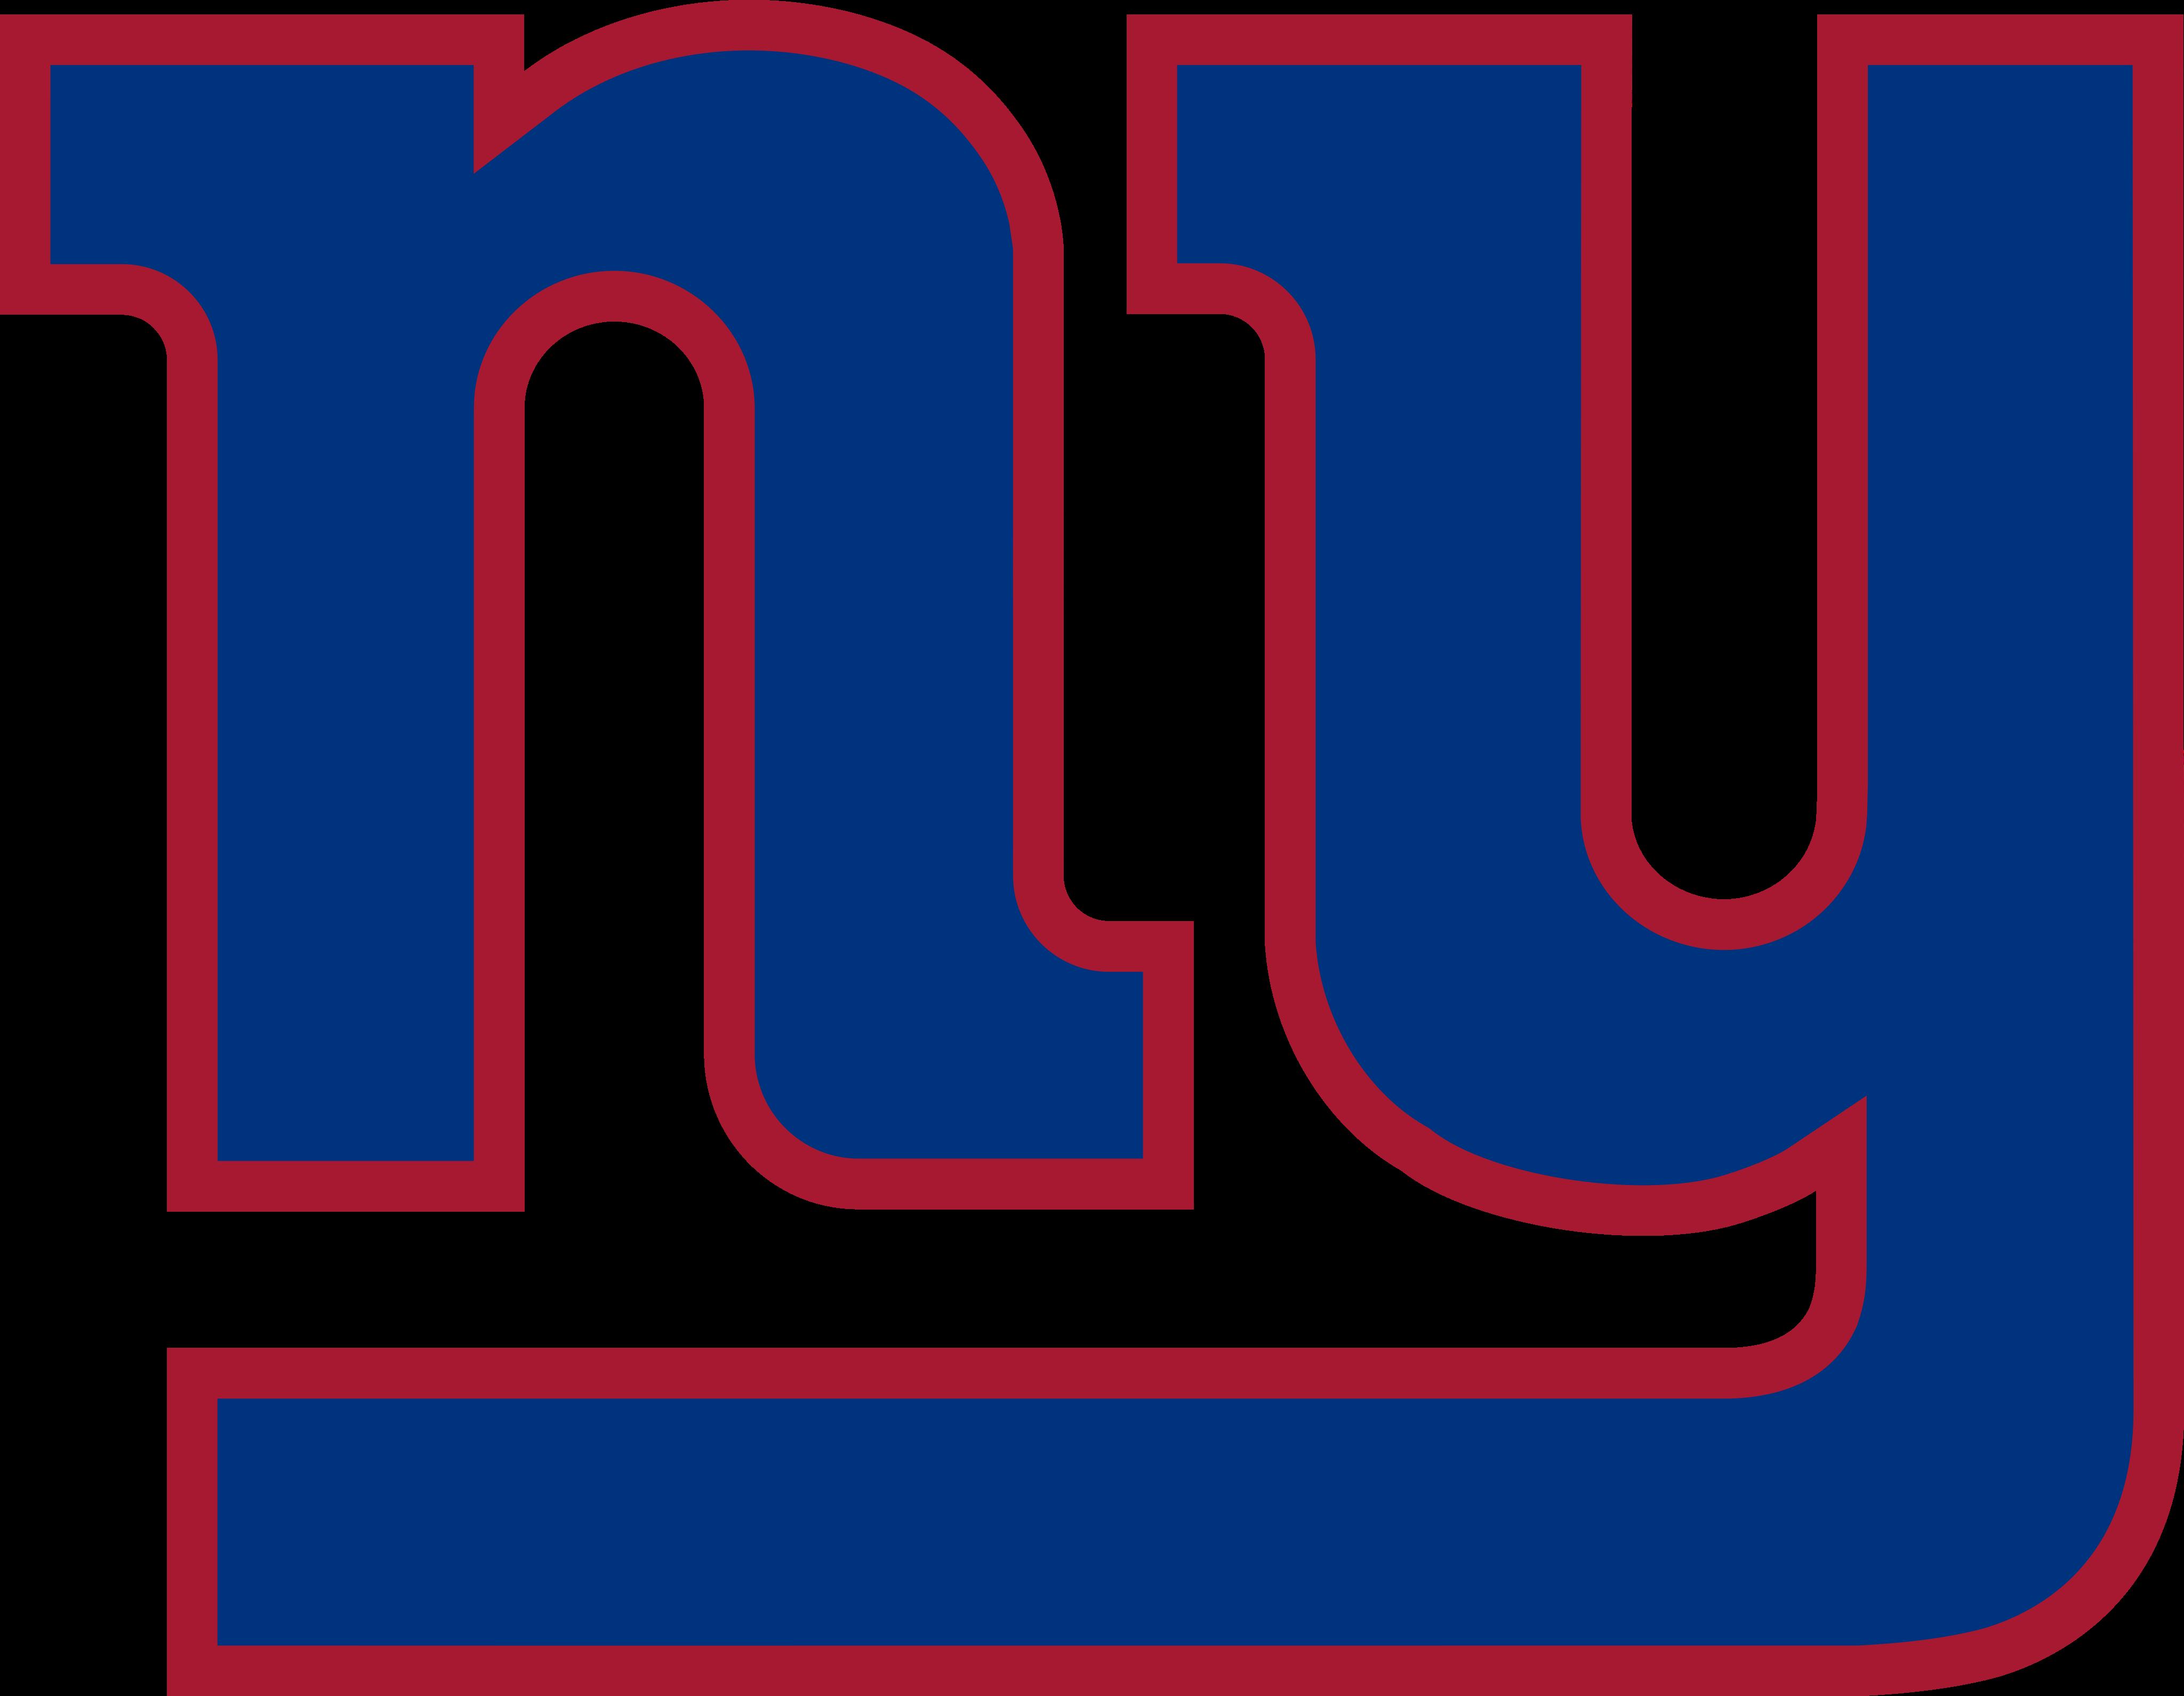 new york giants logo - New York Giants Logo